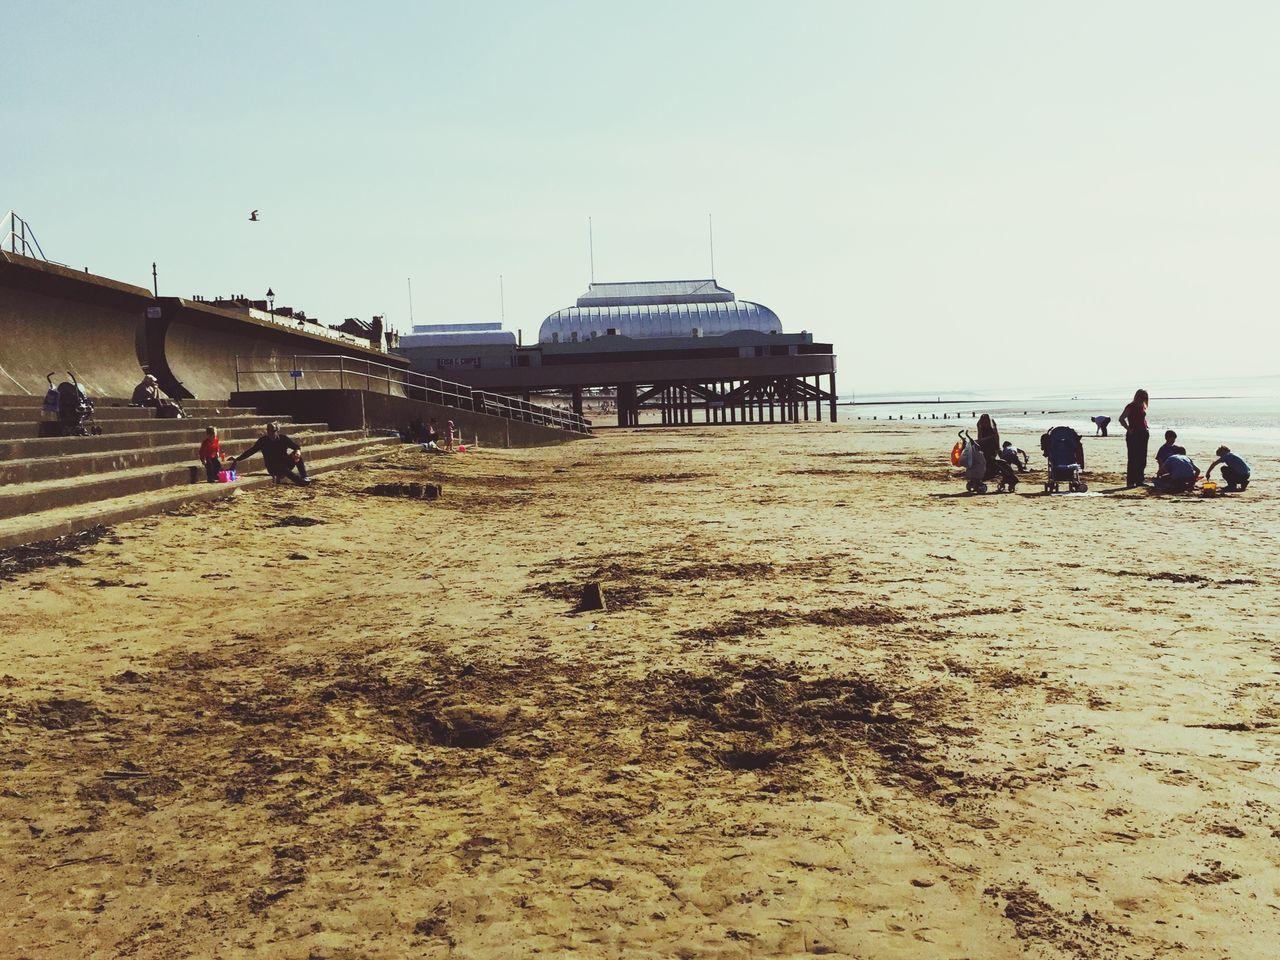 Britain's shortest pier Taking Photos Enjoying Life Beach A Day At The Beach United Kingdom